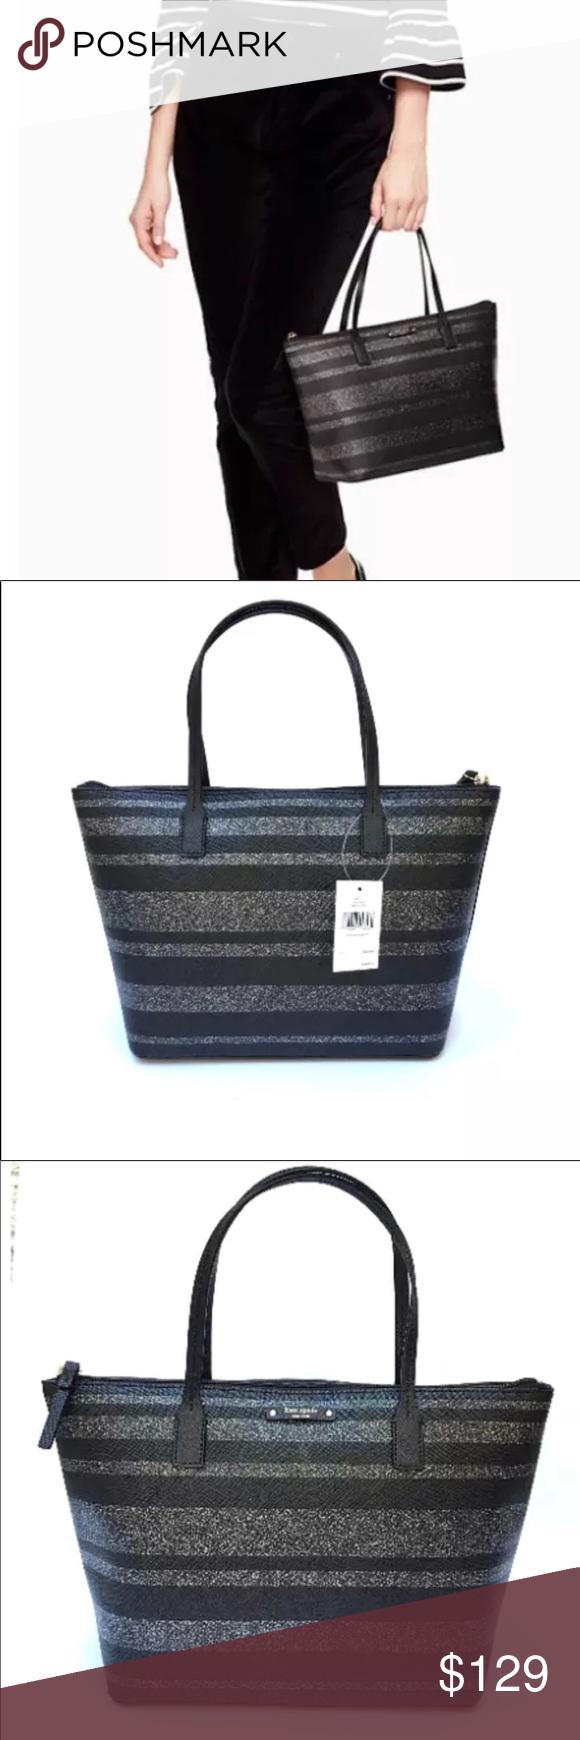 3de2a121a5161 Kate Spade Hani Haven Ln.Black Glitter Stripe set Listing includes both  handbag and